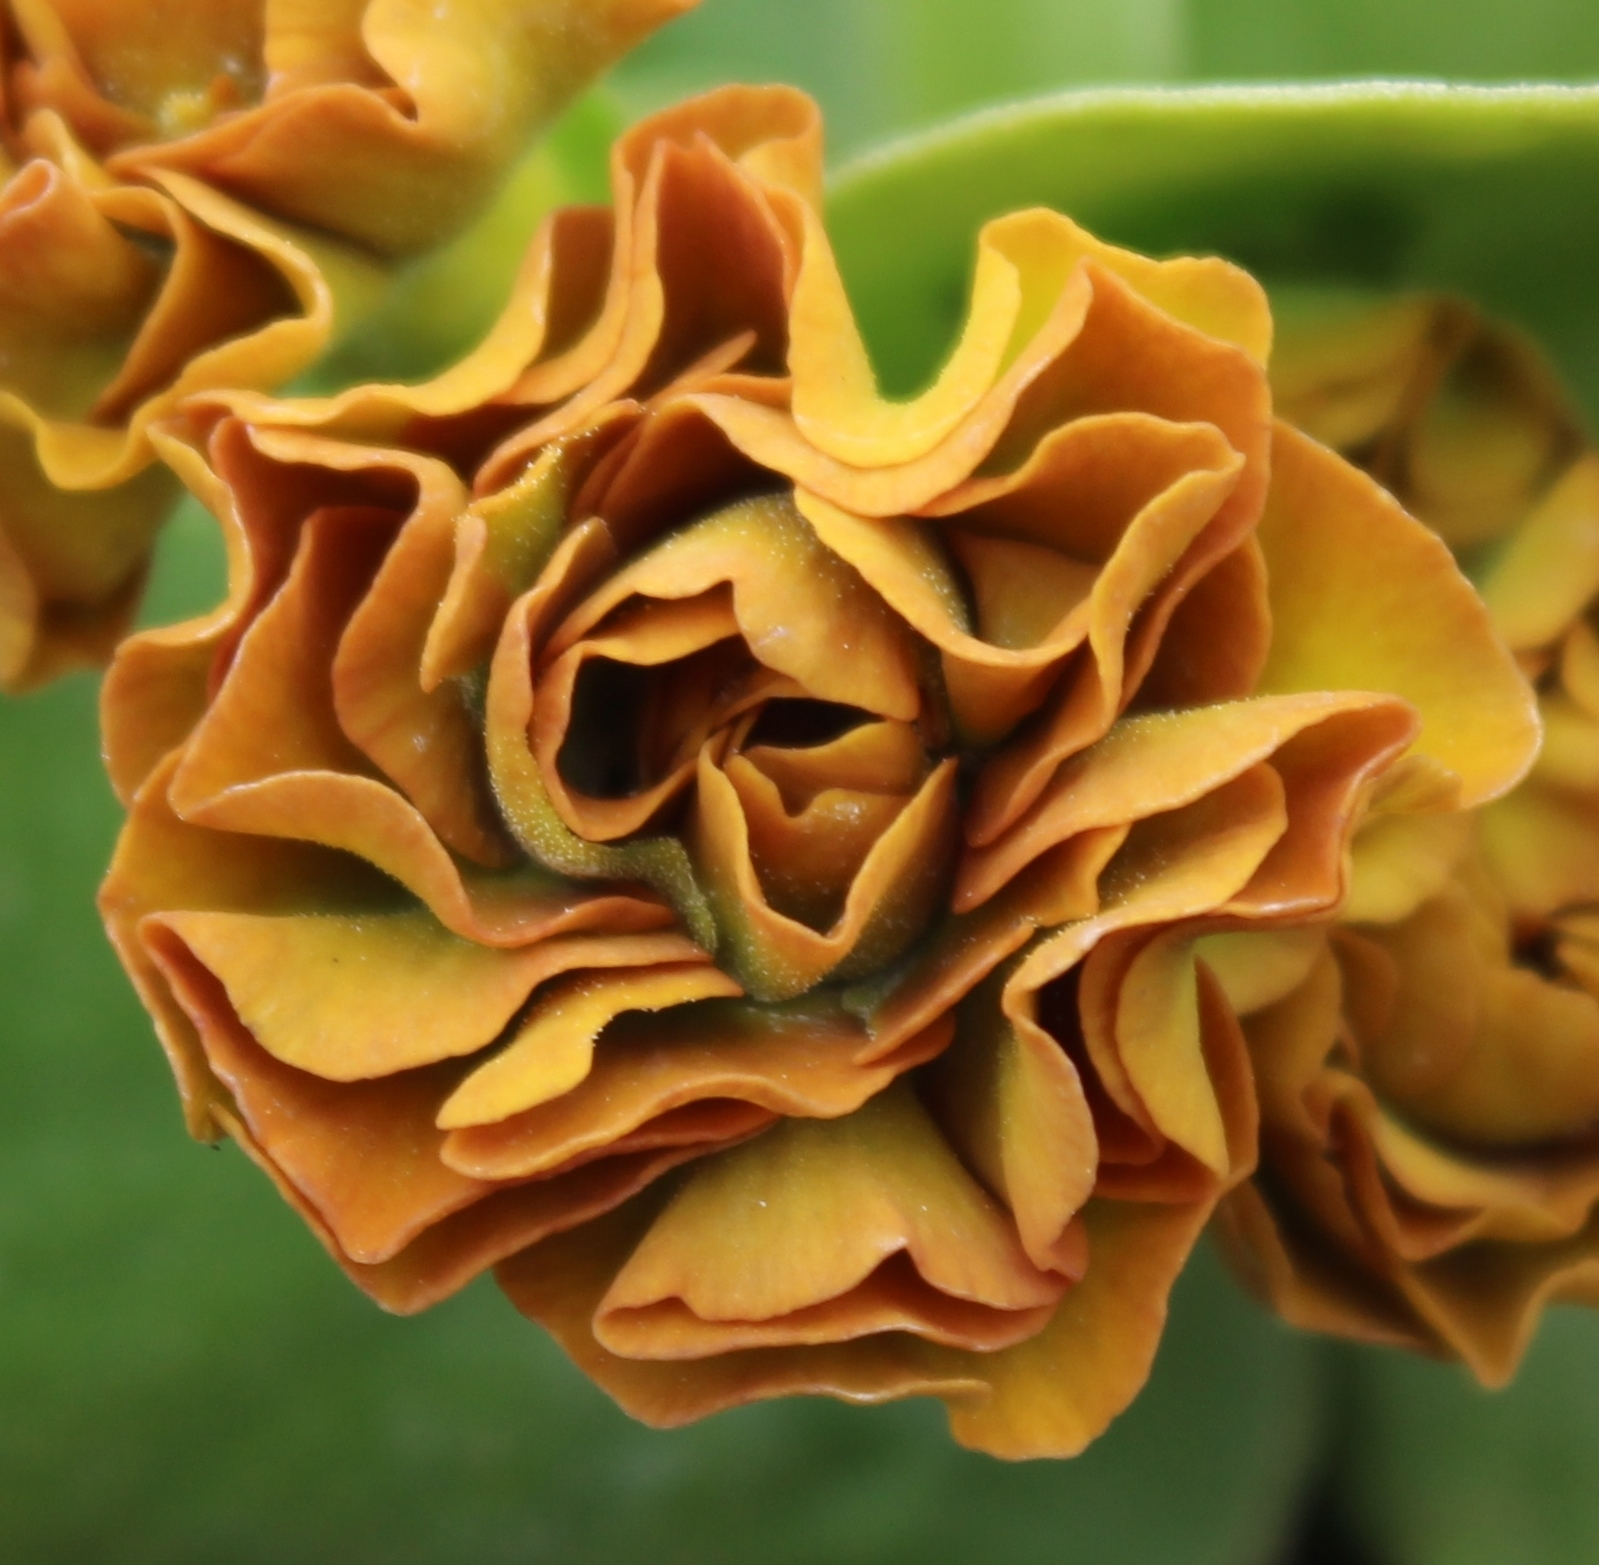 Picture of Primula auricula 'Forest Cappuccino'